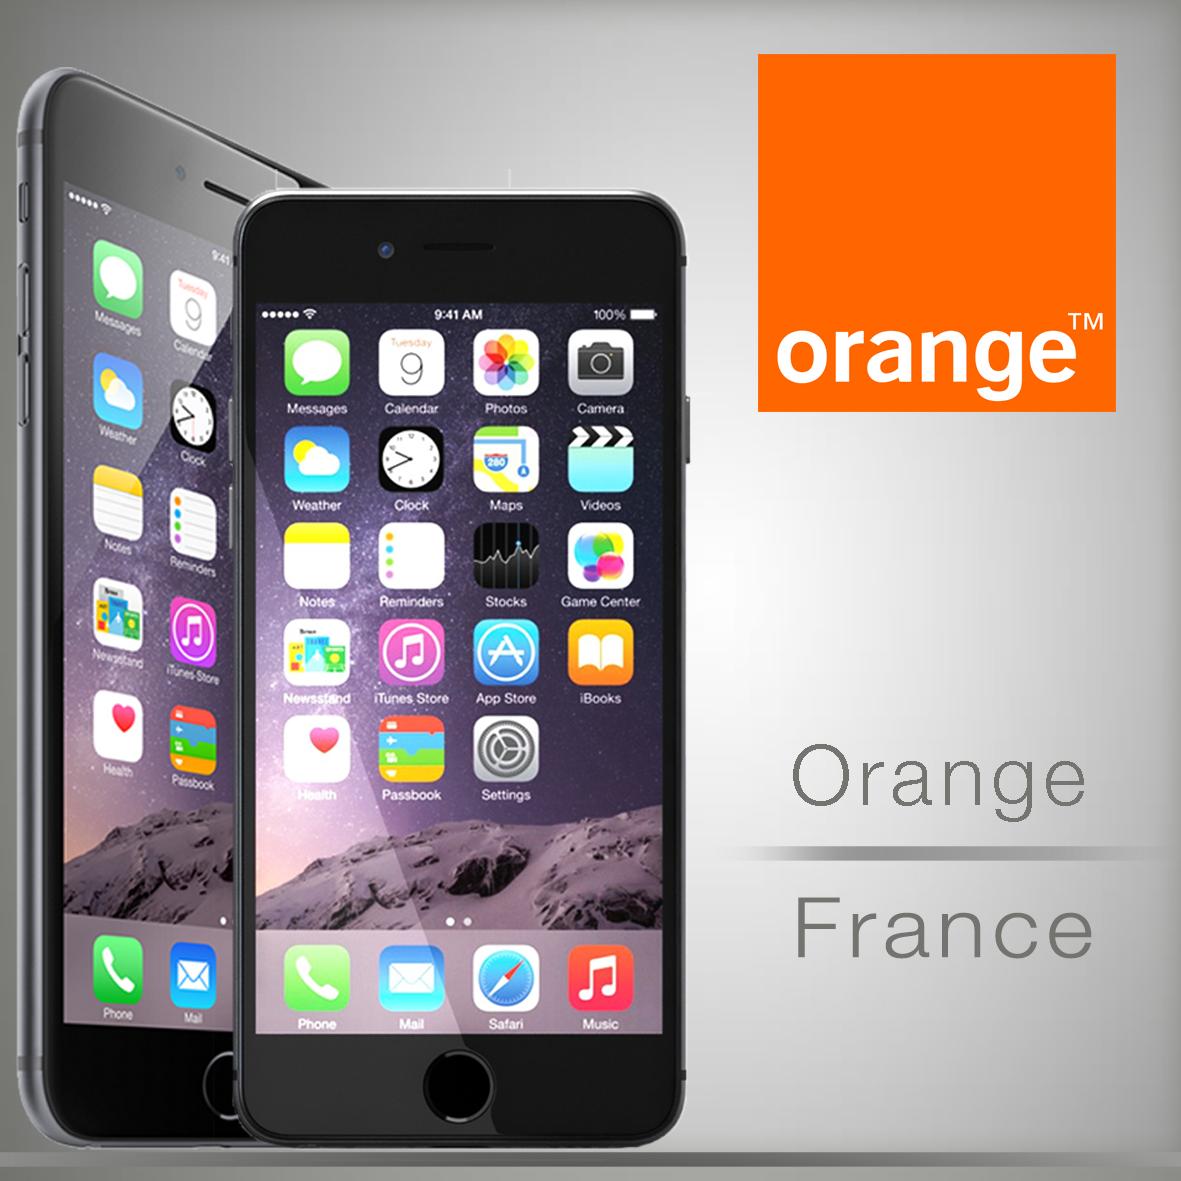 unlock iphone 4 orange france imei free